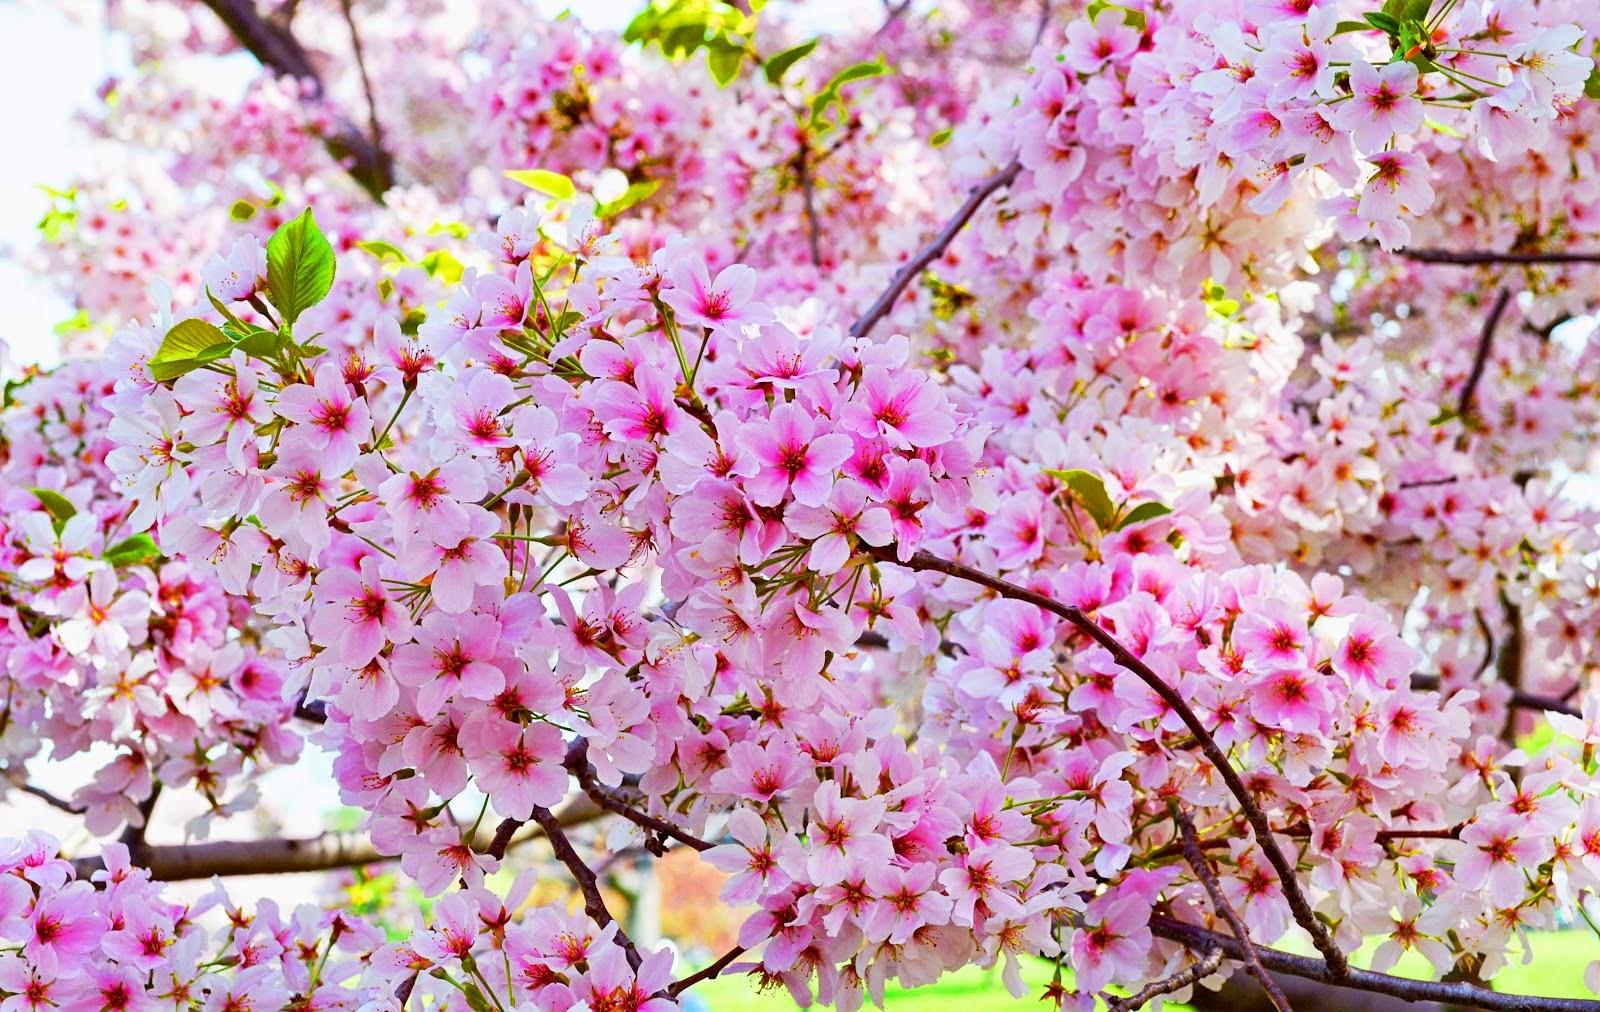 Gambar Kartun Pohon Sakura Bunga Sakura Merah Muda